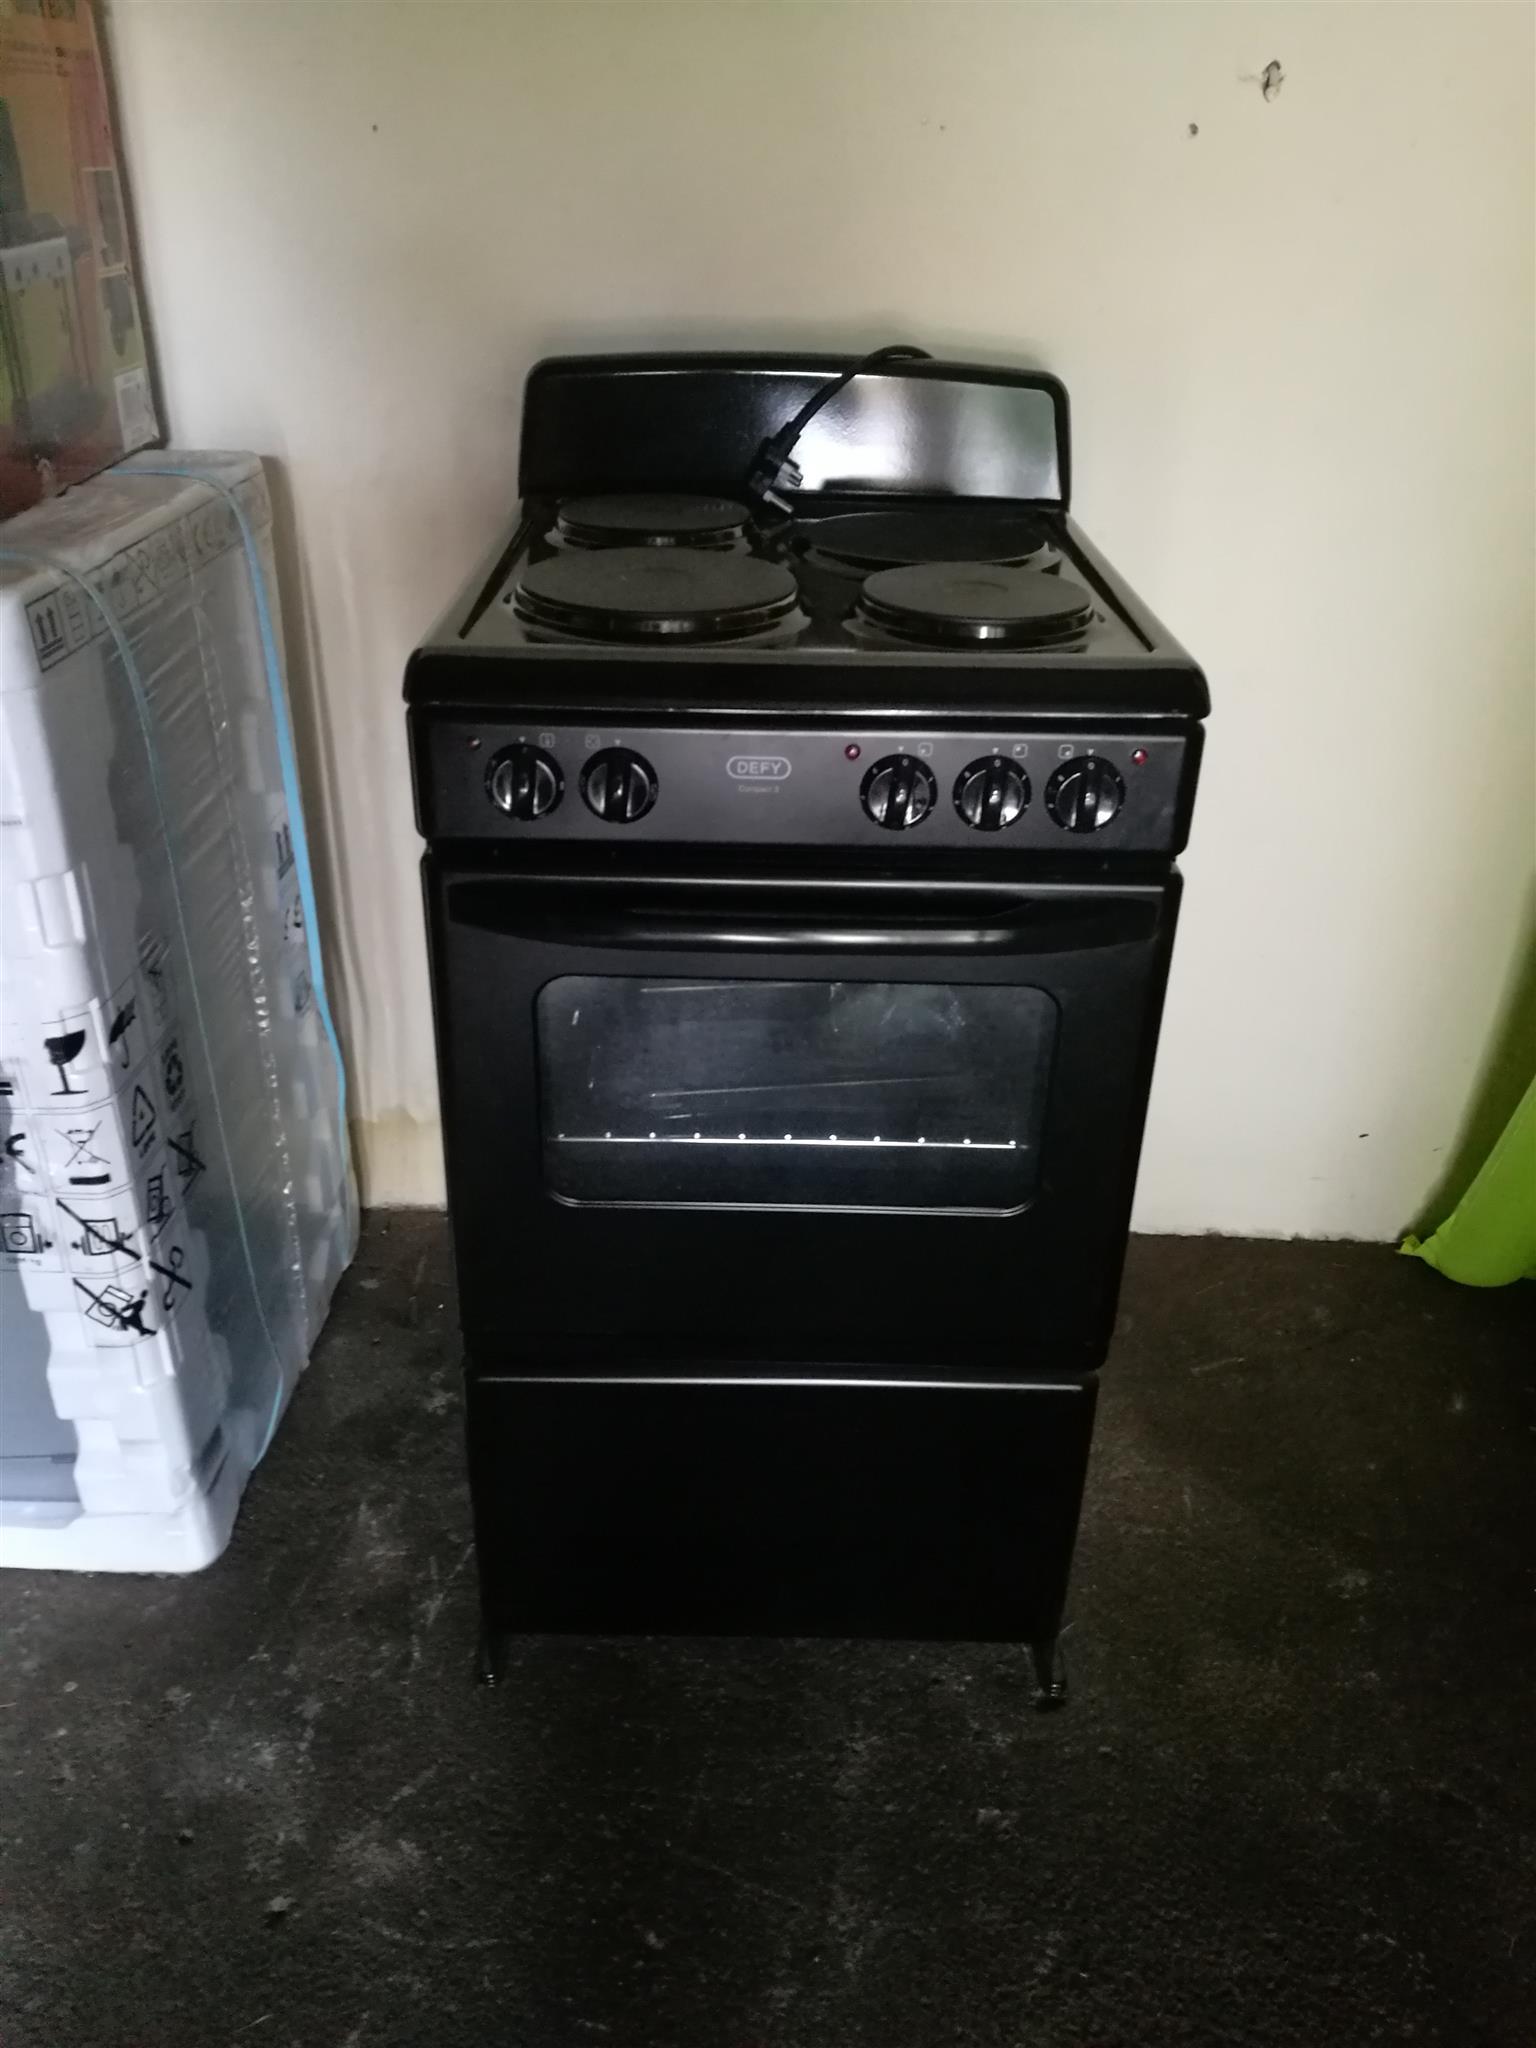 Defy 3 plate stove